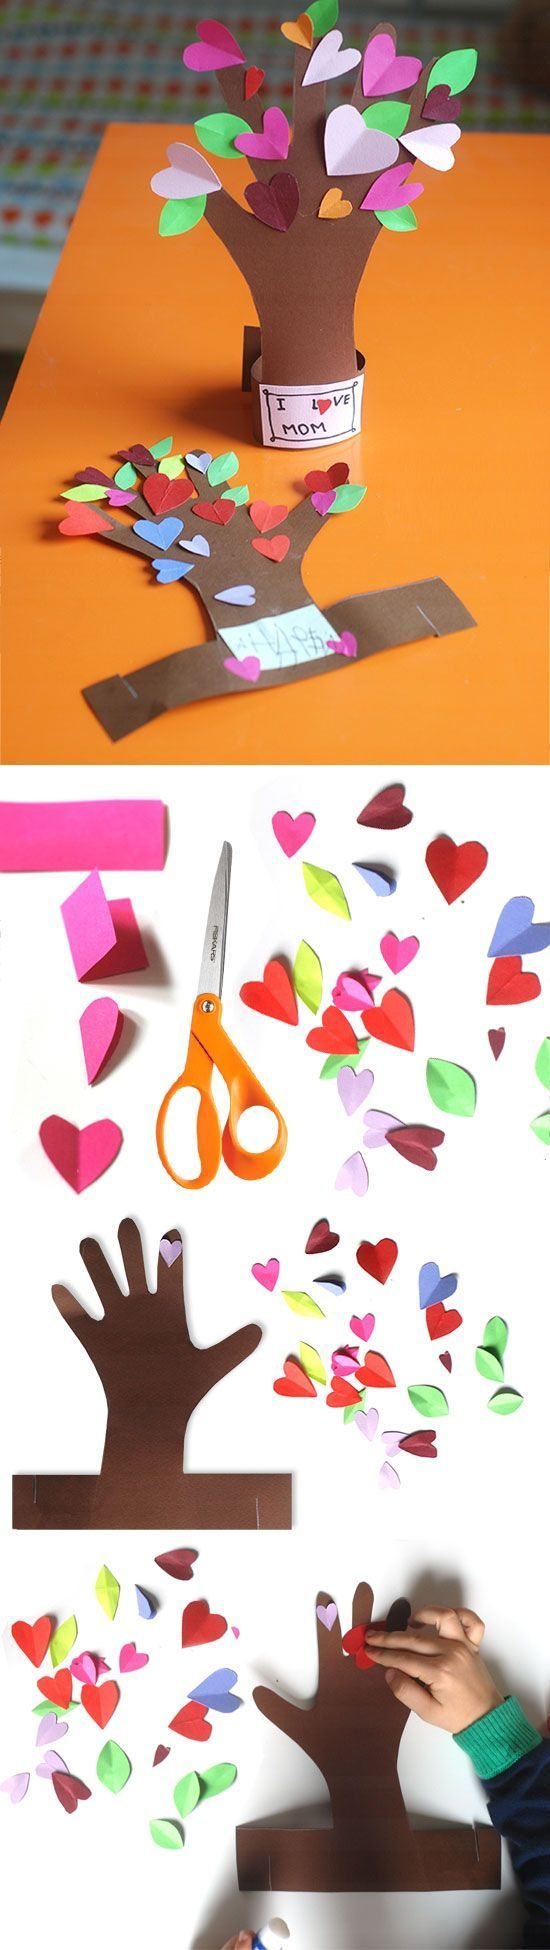 20 Valentines Crafts For Kids To Make Holiday Valentine S Day